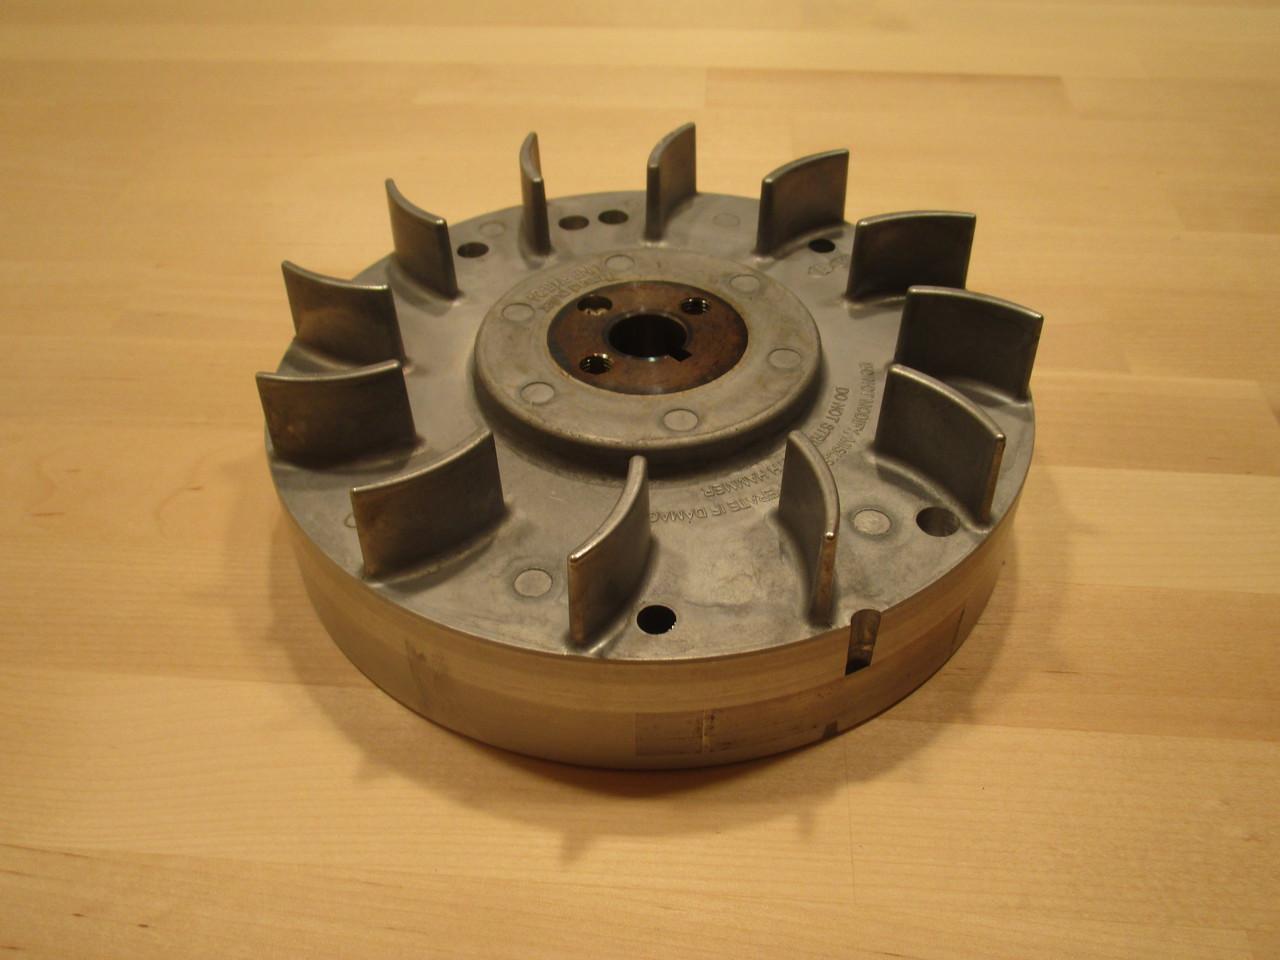 PVL Flywheel for Clone / GX200 Honda (AKRA / NKA / WKA Legal)